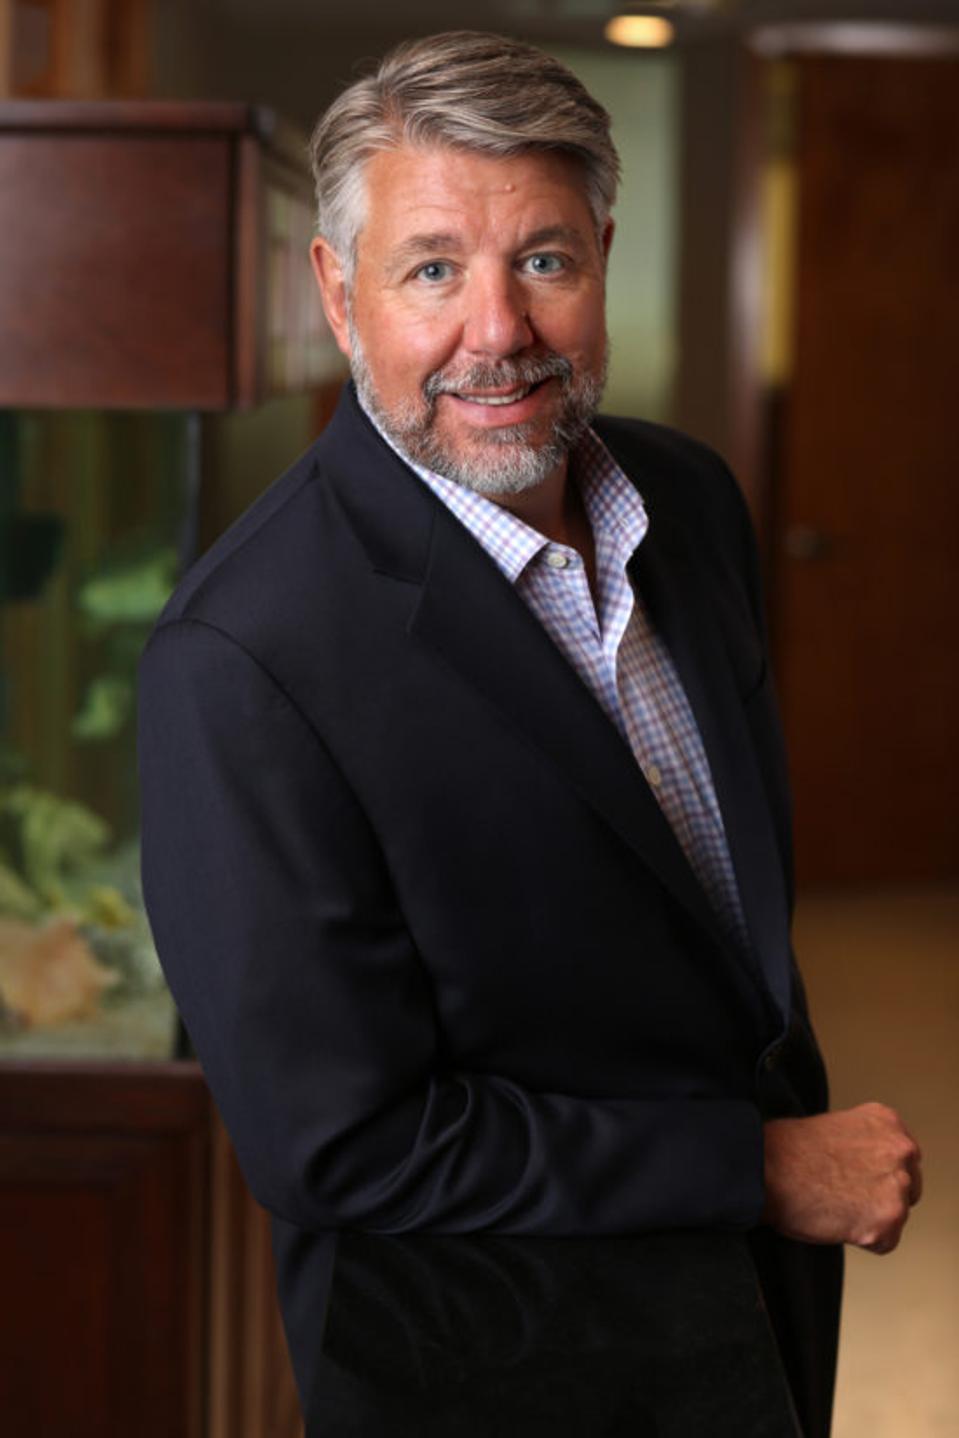 Christopher Cordaro, RegentAtlantic Chief Investment Officer